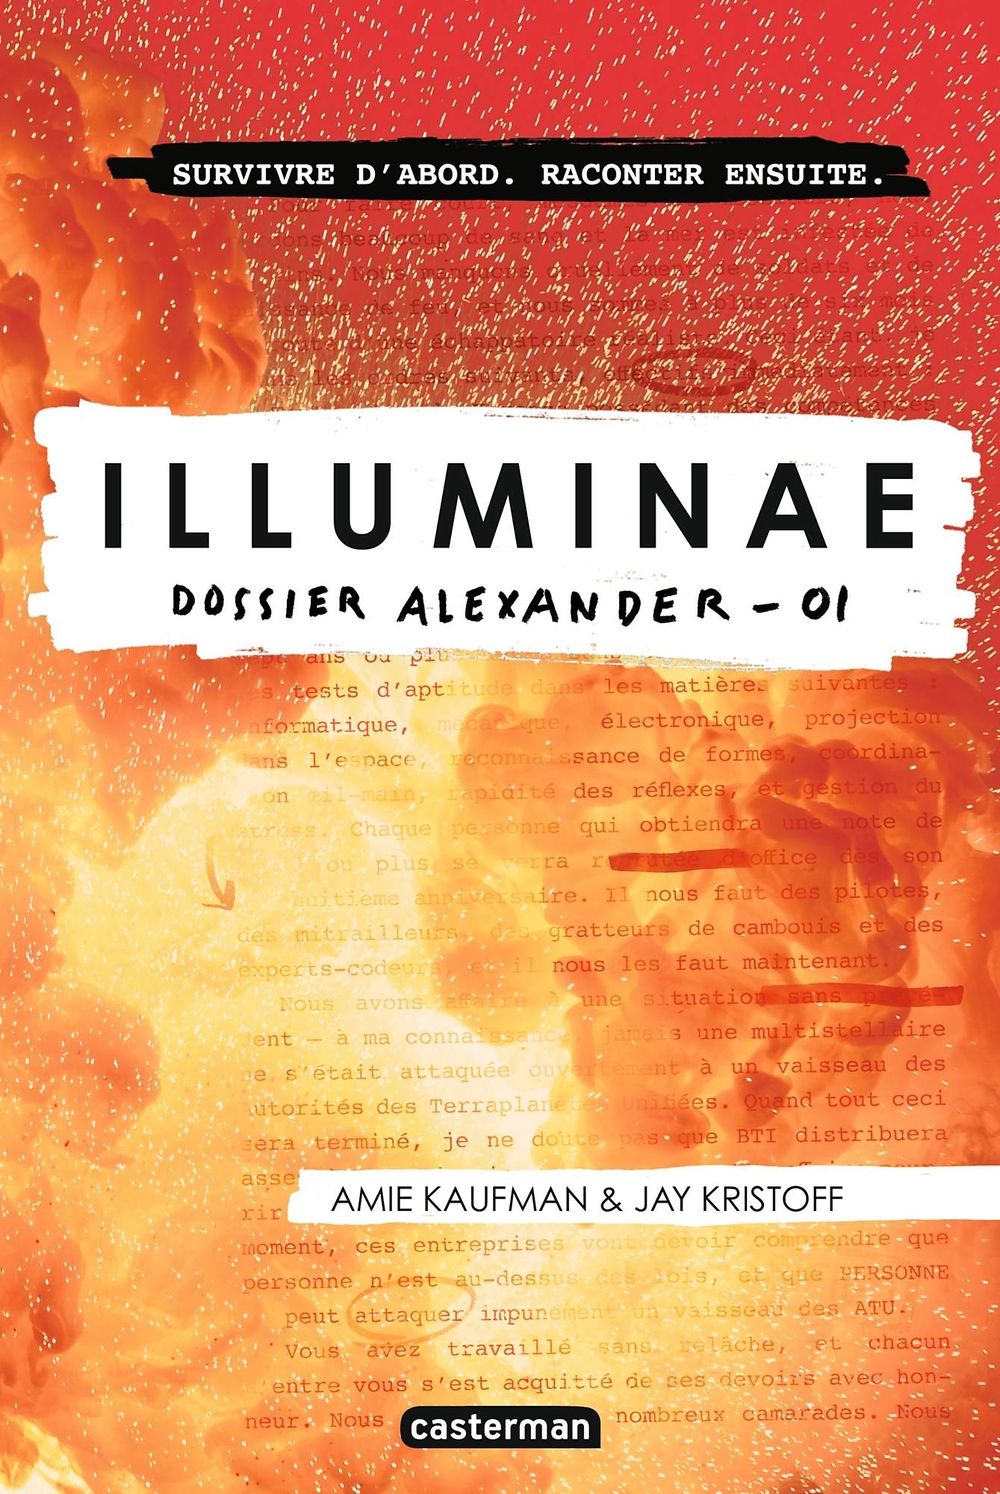 Illuminae (Tome 1) - Dossier Alexander | Kristoff, Jay